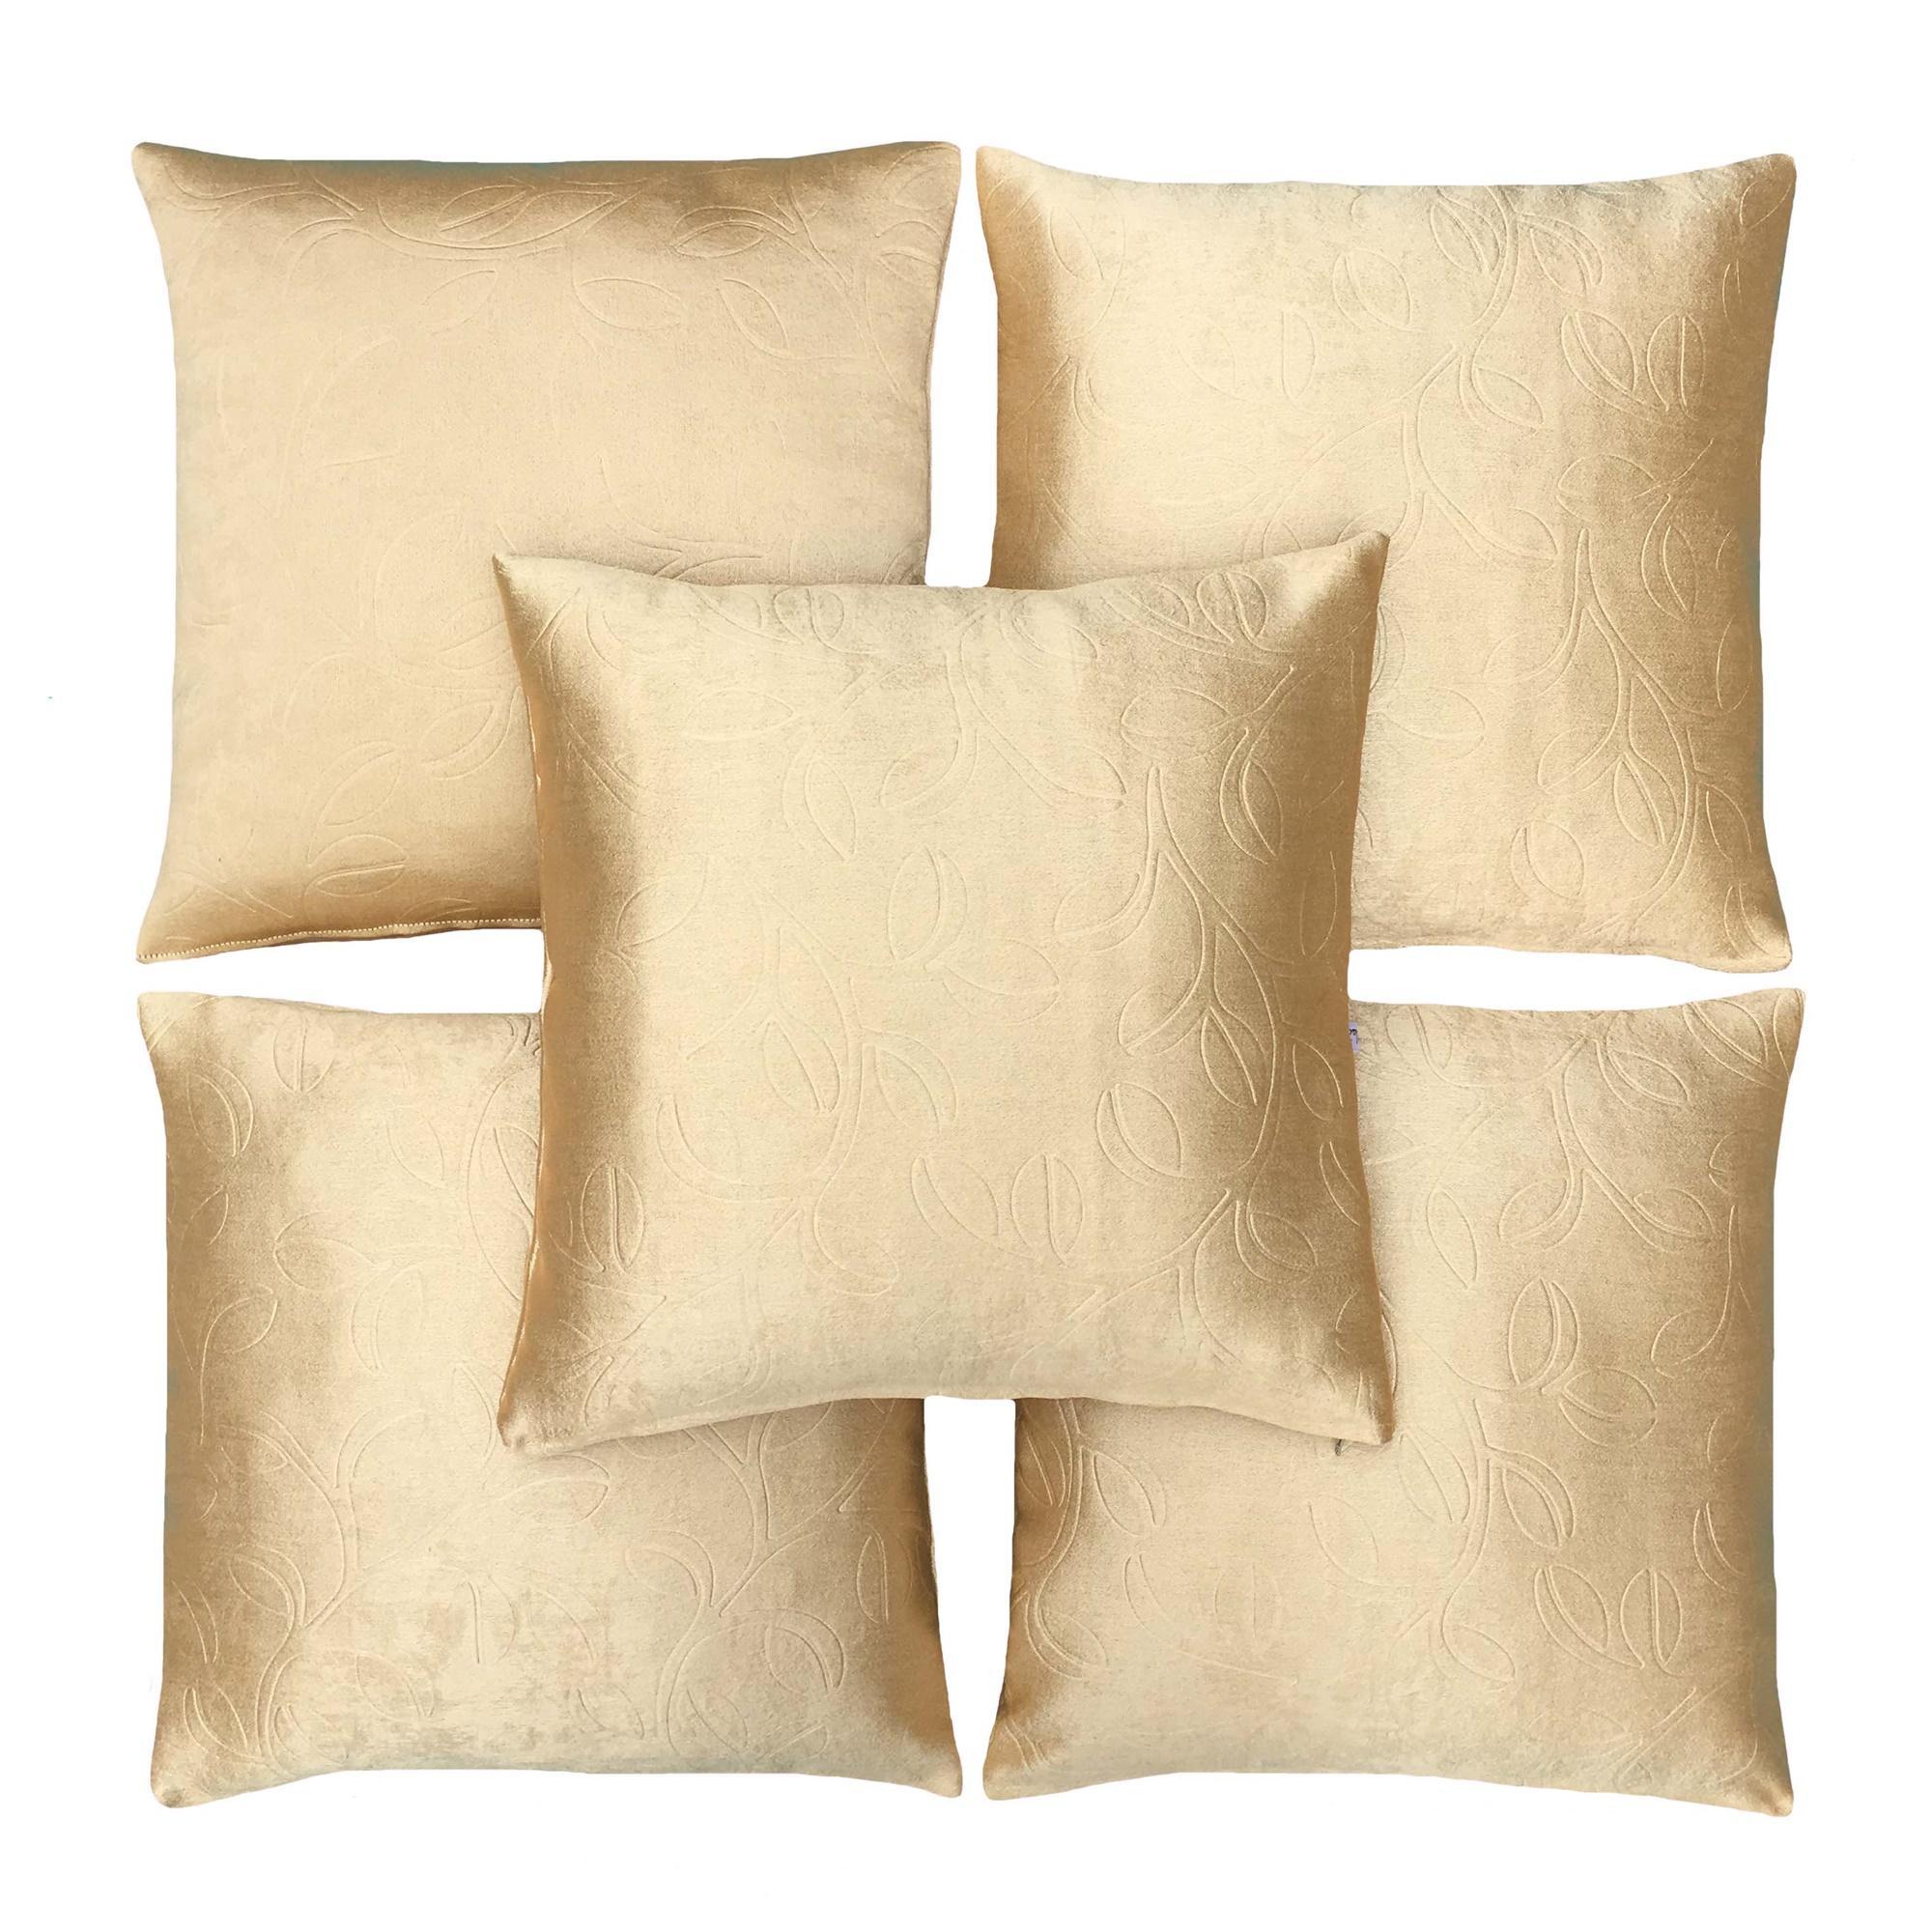 Flanelade Sarung Bantal Sofa Motif Embos Bold - Gold - 5 Buah